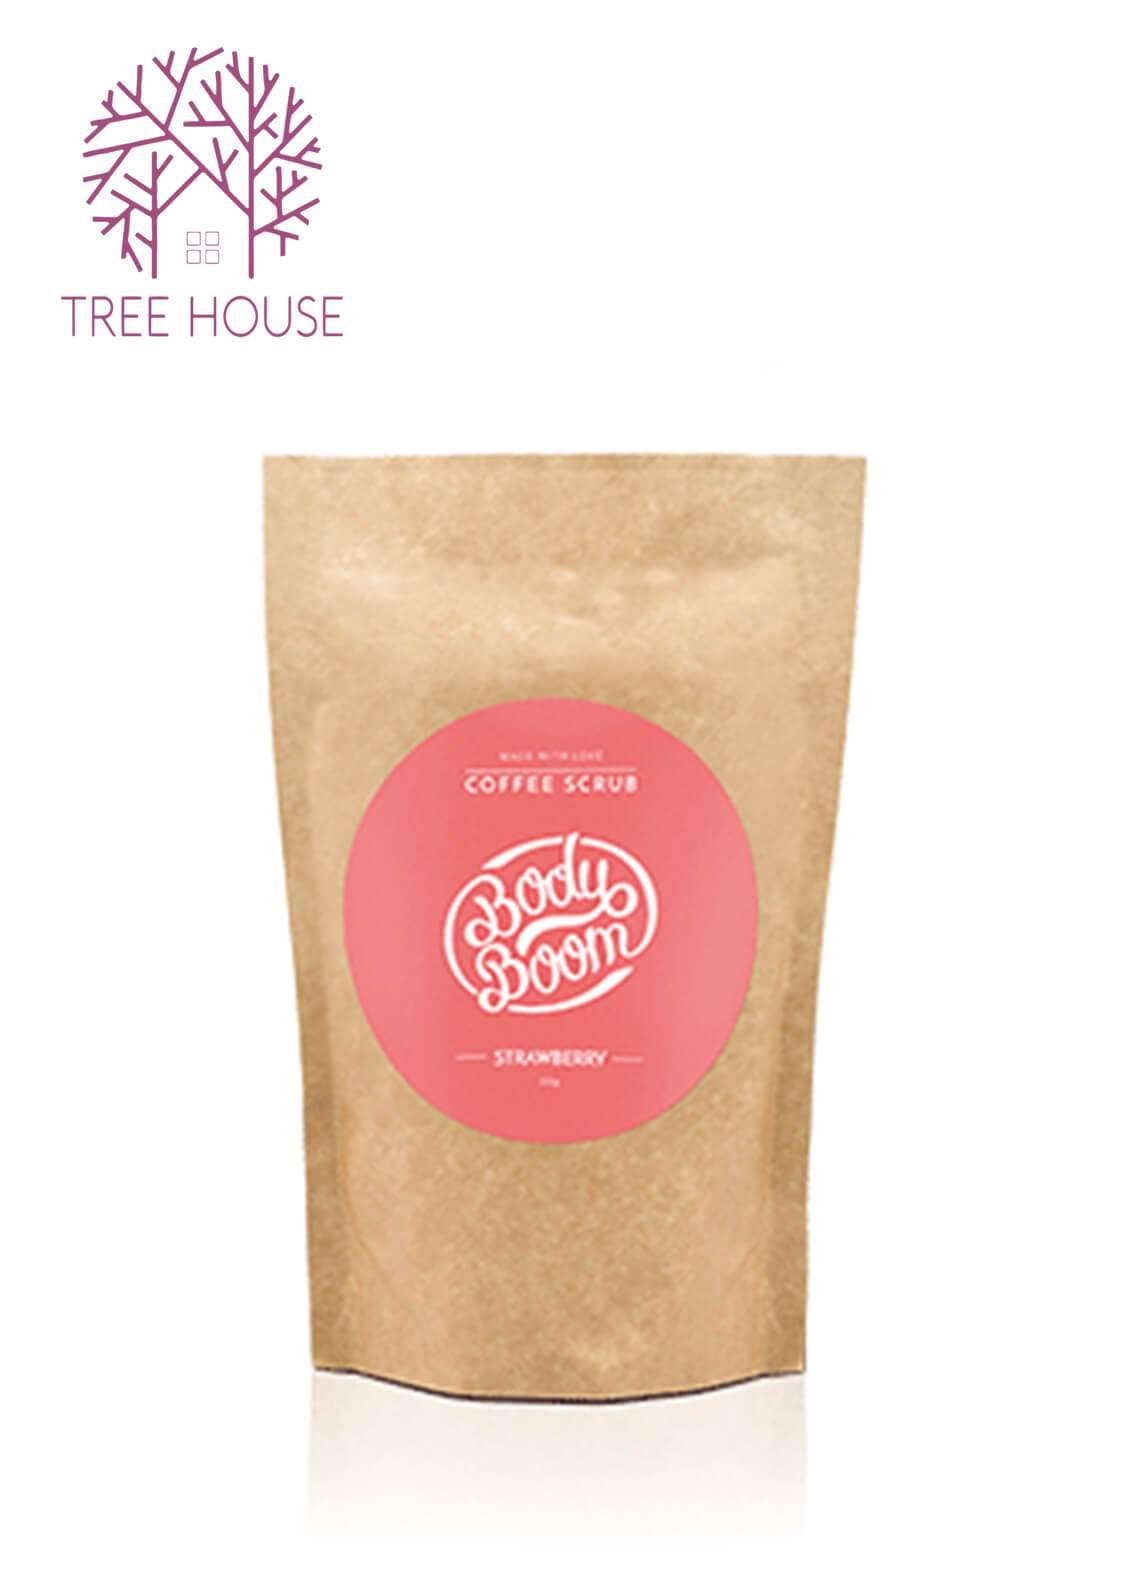 Body Boom Coffee Scrub (Strawberry Flavour)